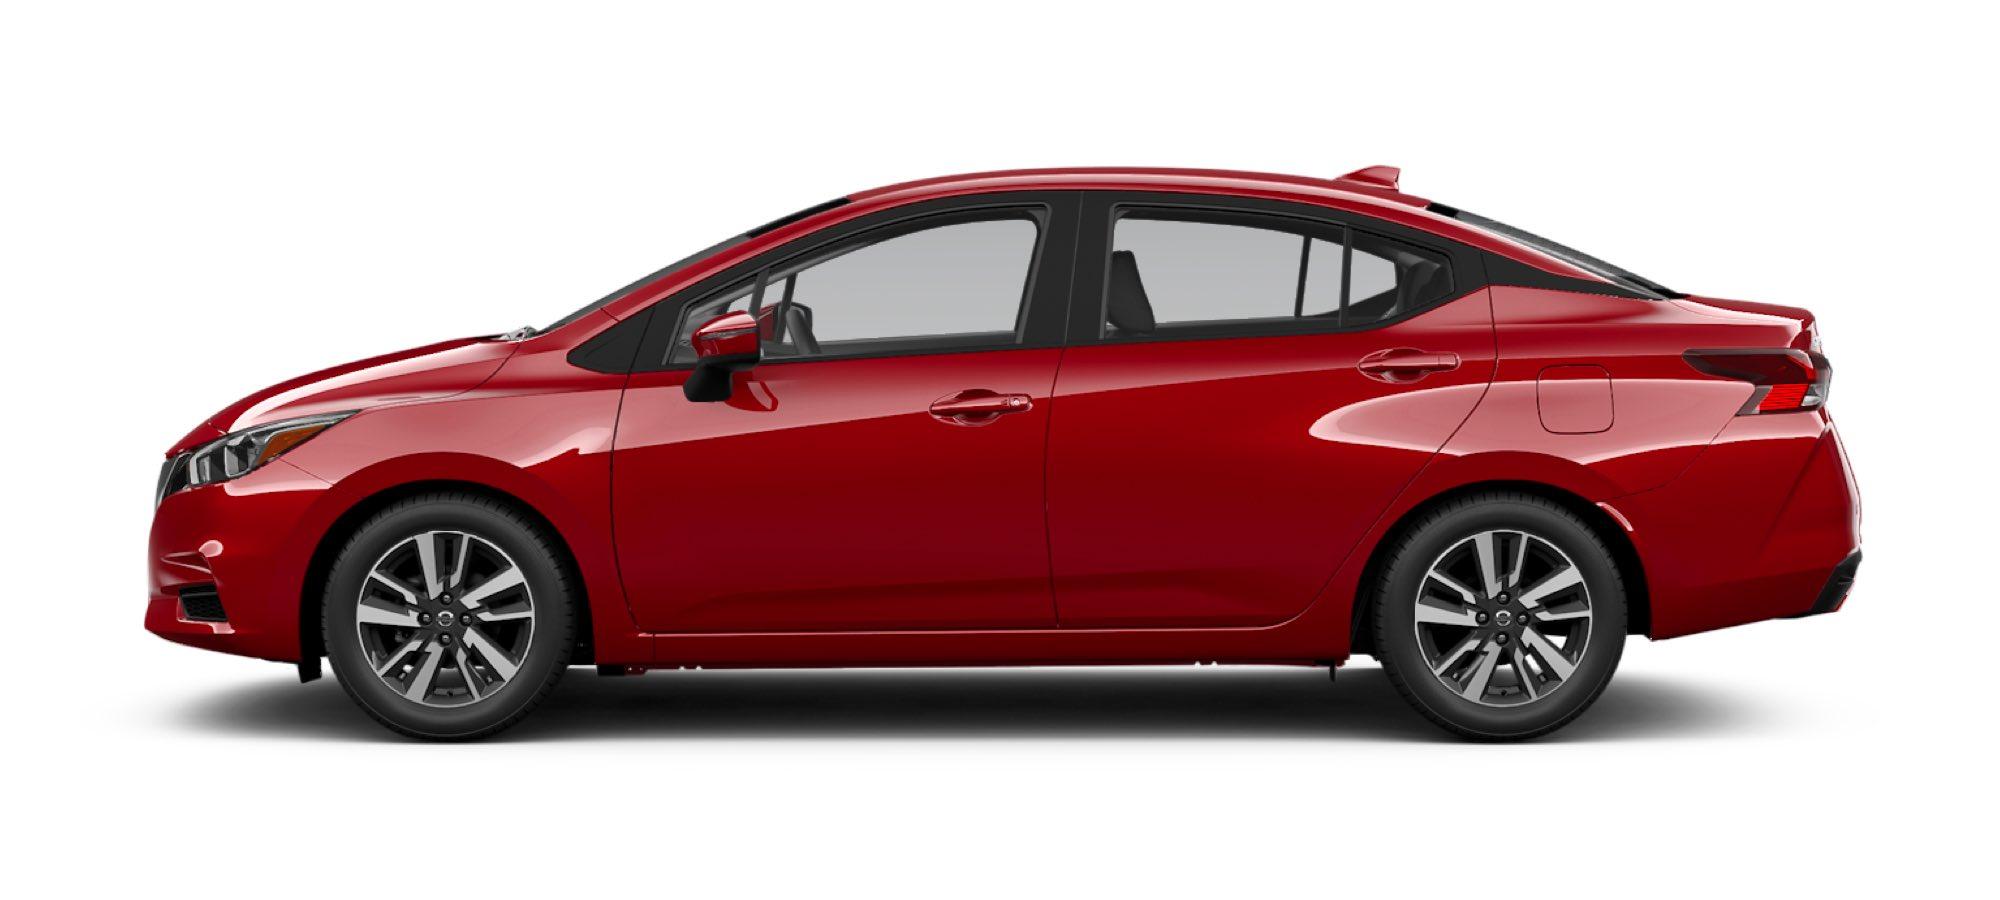 2021 Nissan Versa in Scarlet Ember Tintcoat